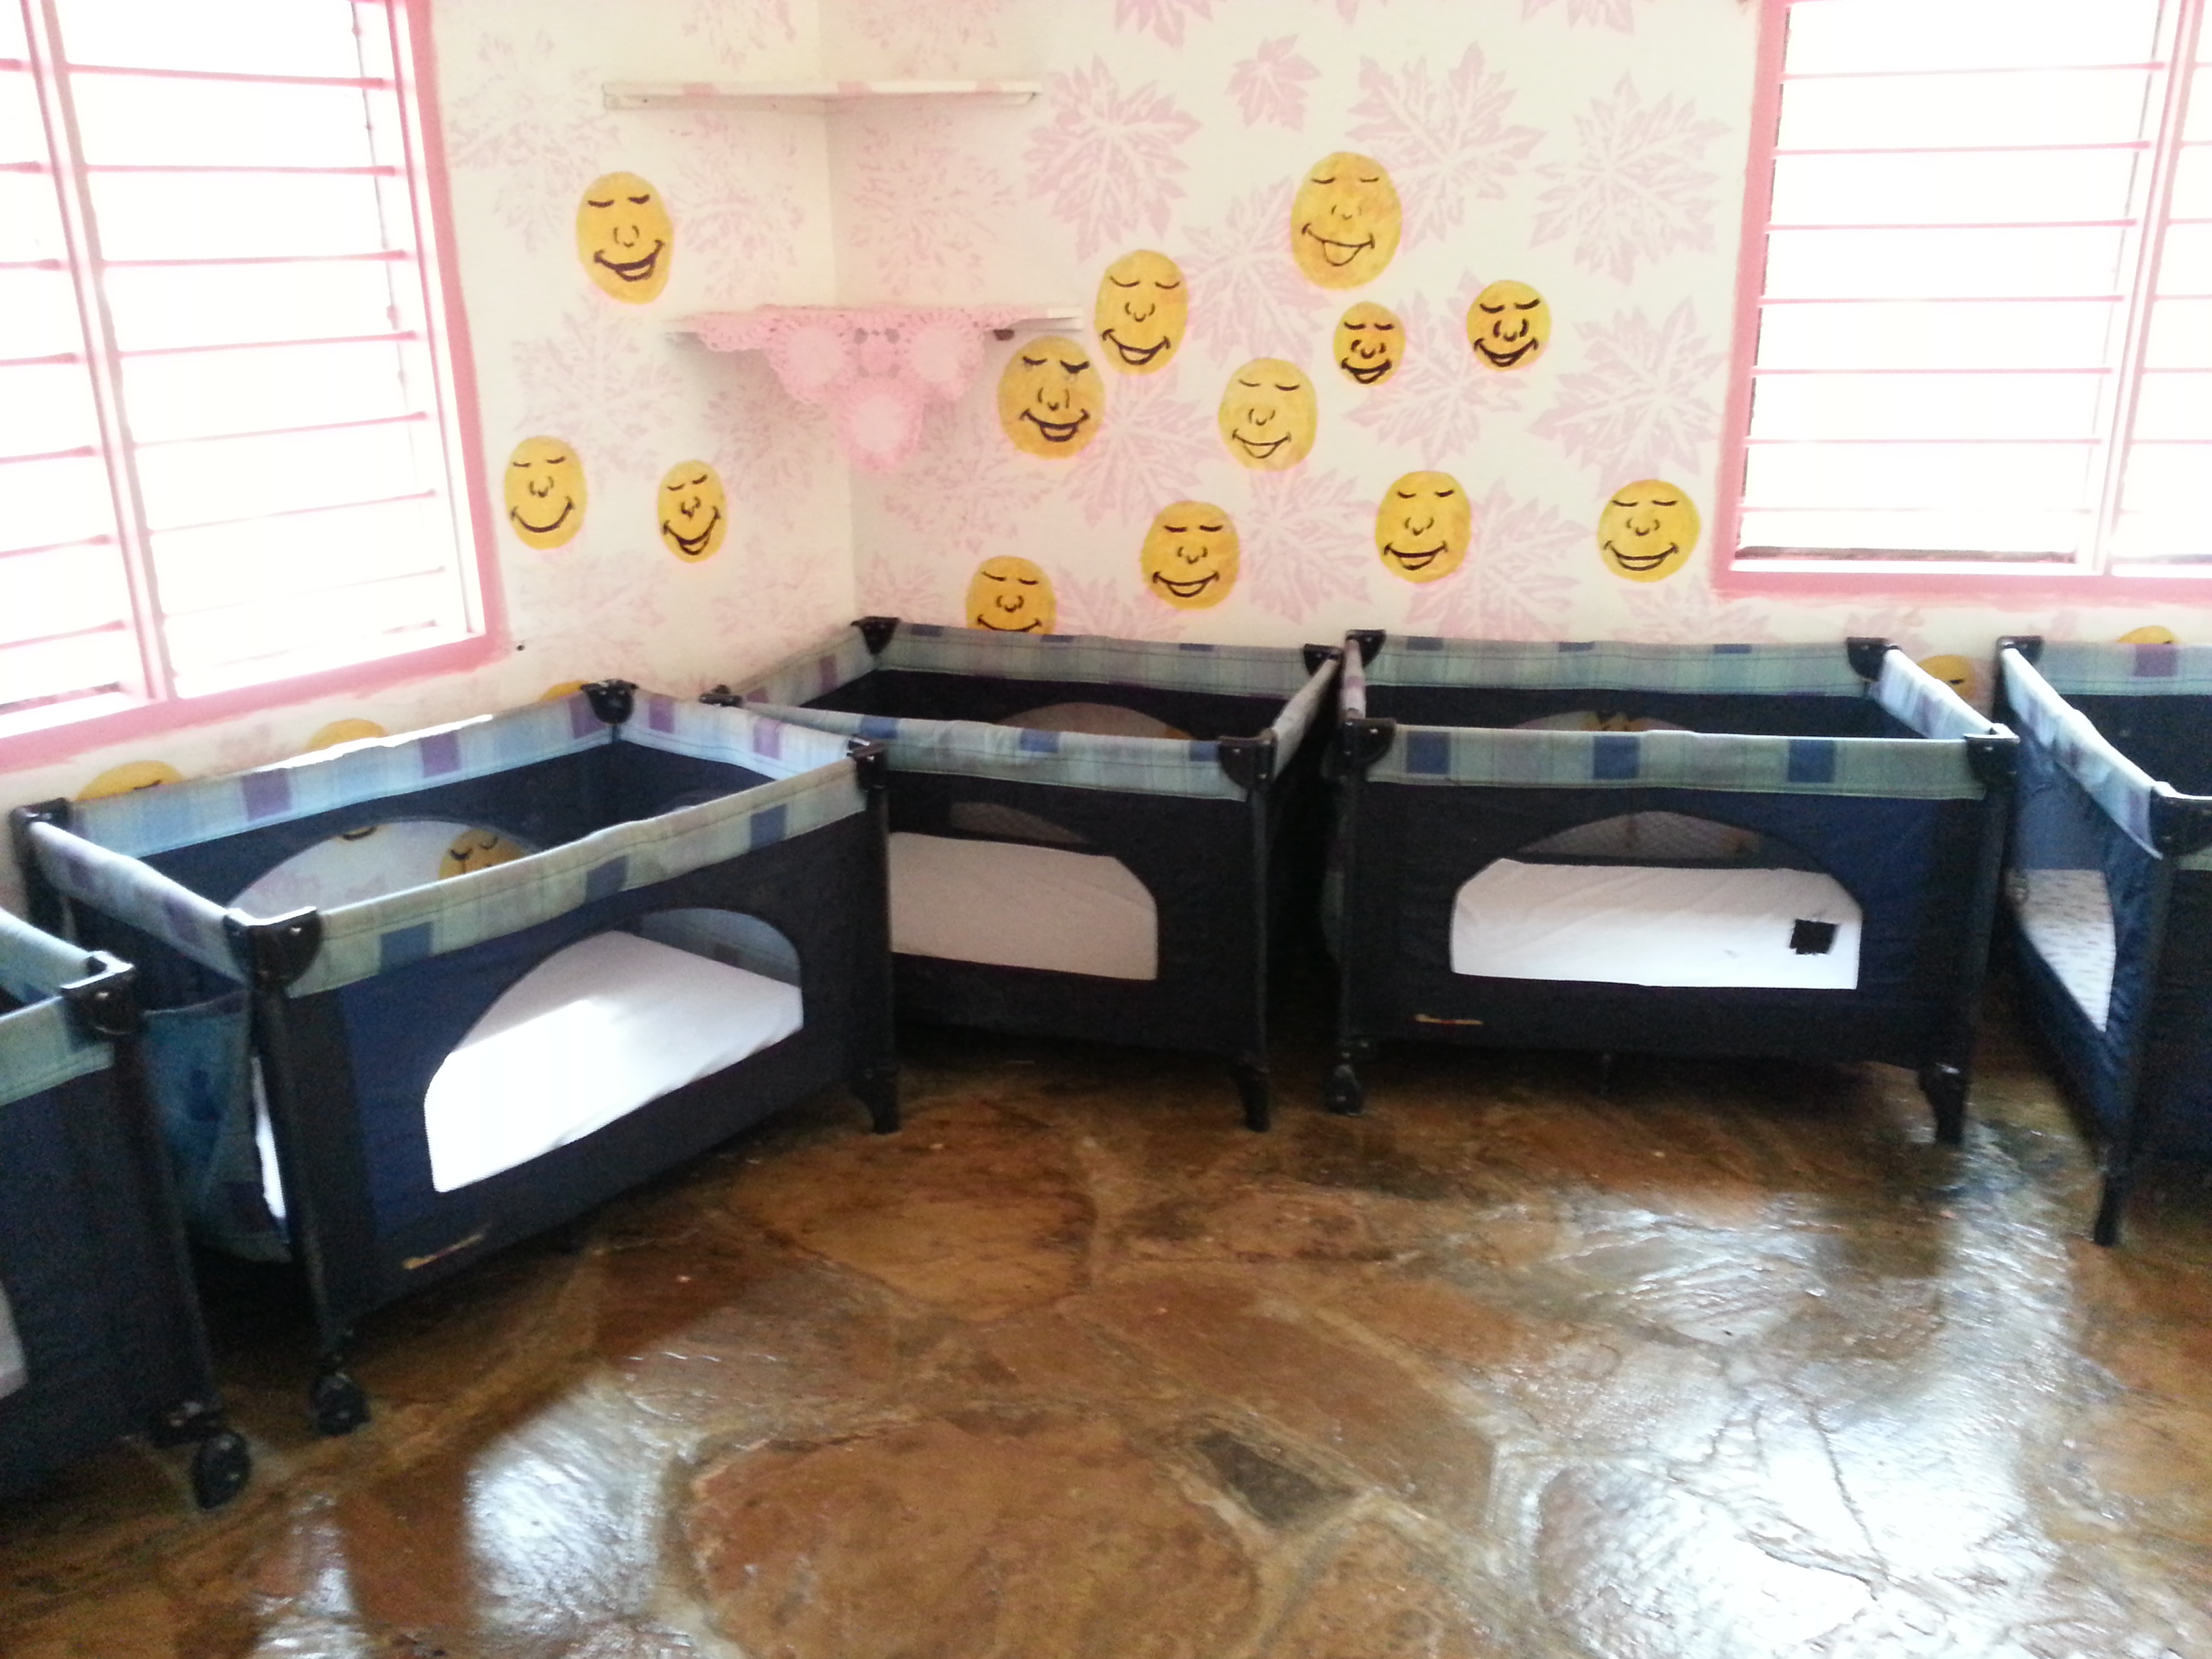 Kamer poster idee baby - Baby slaapkamer ...